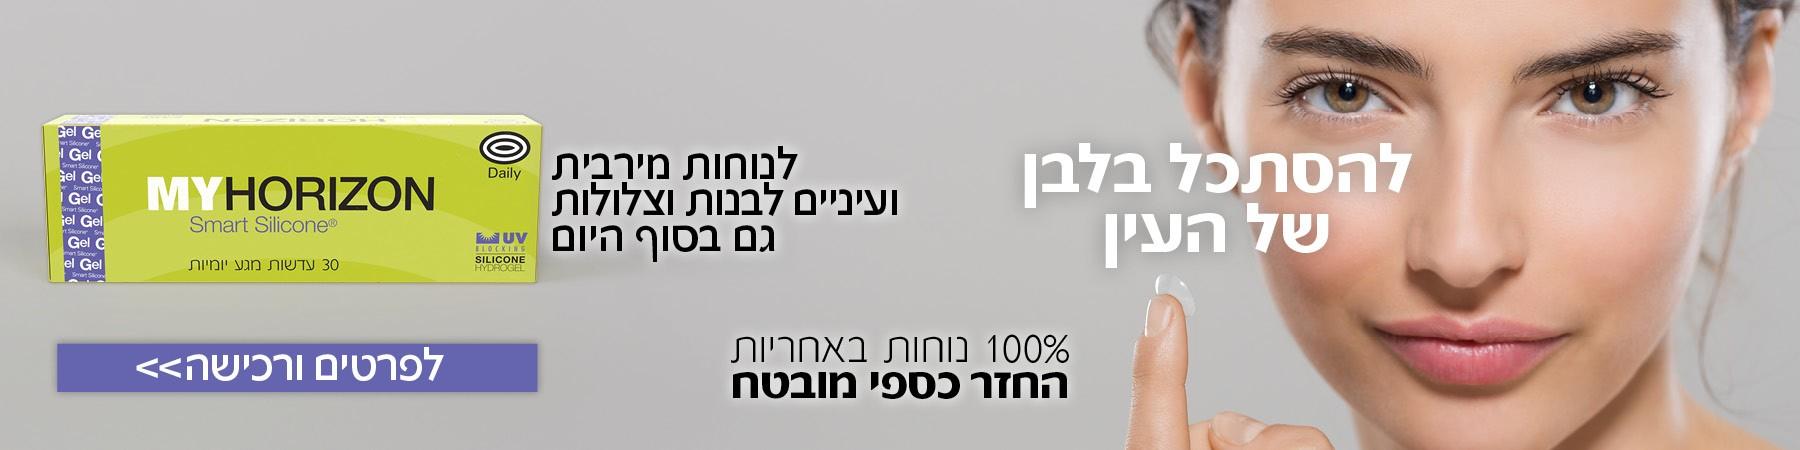 קמפיין מיי הורייזן